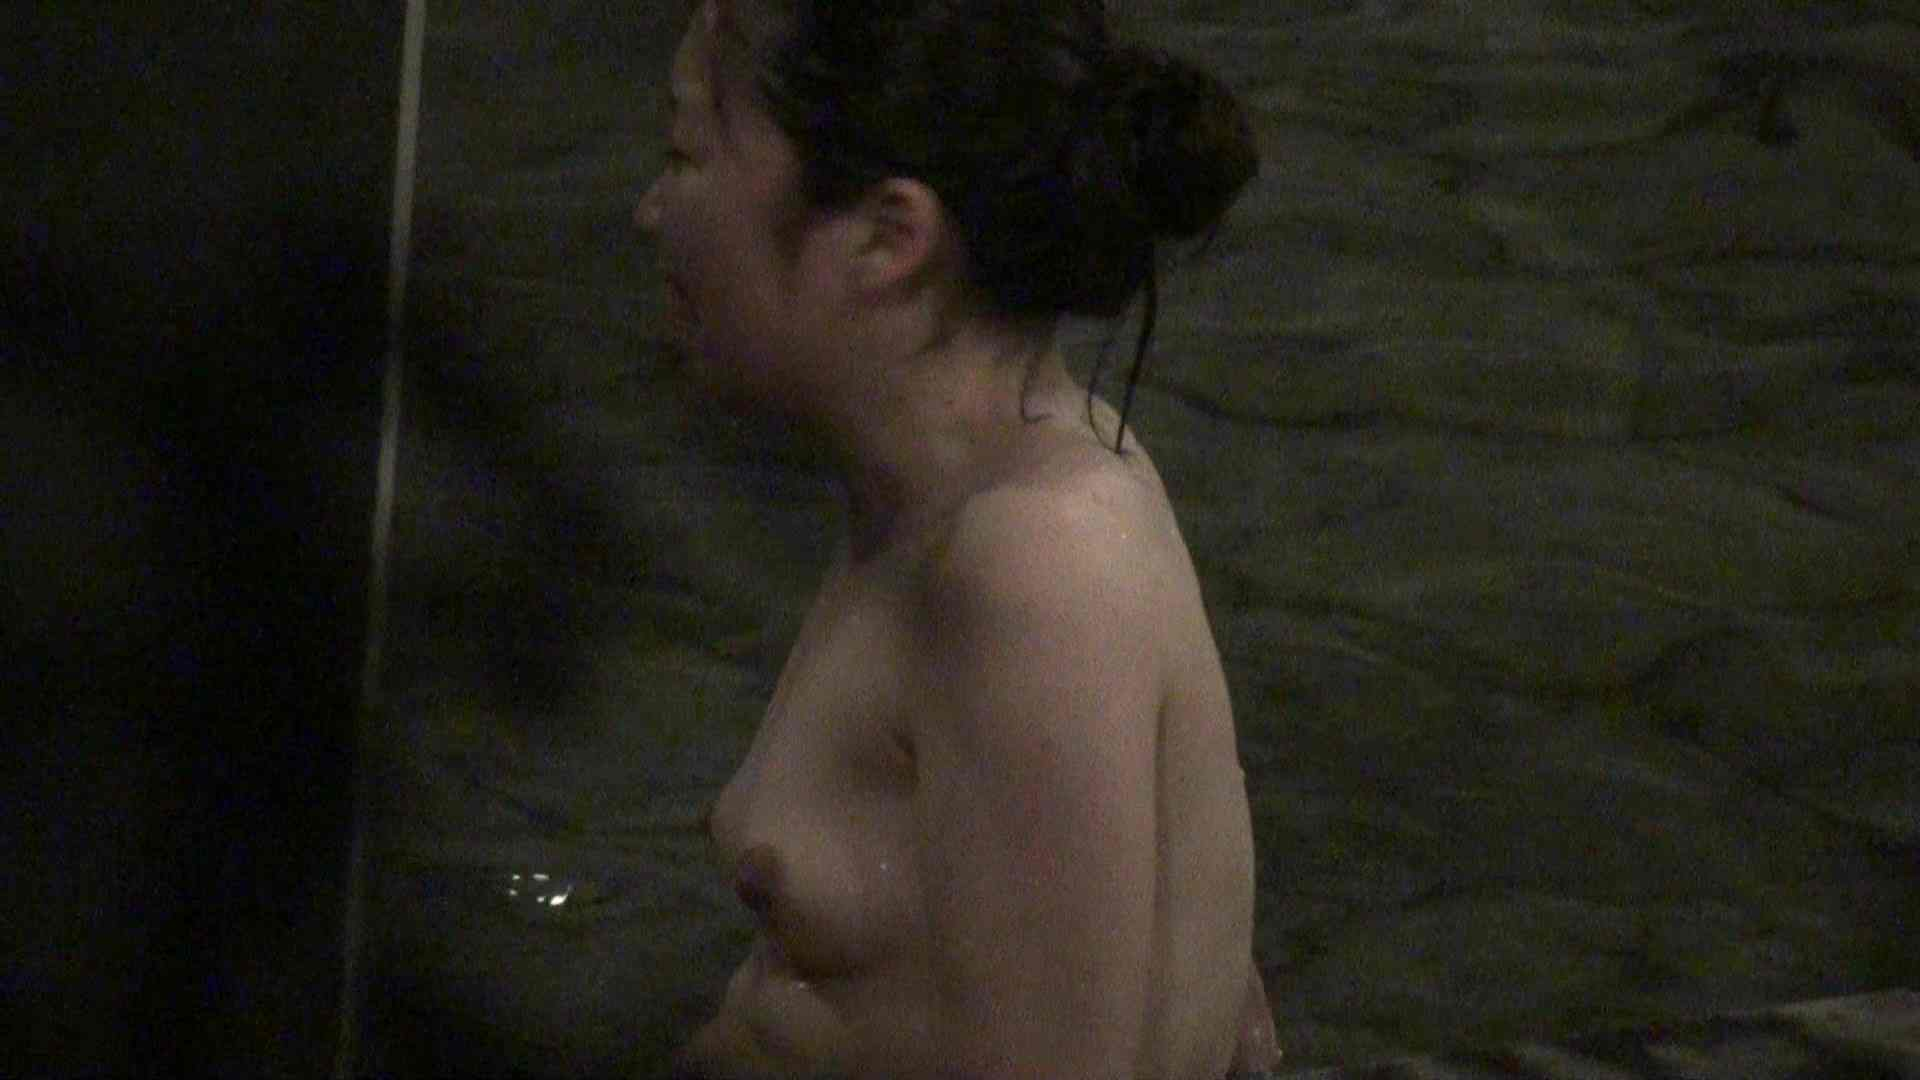 Aquaな露天風呂Vol.342 盗撮師作品  107pic 9